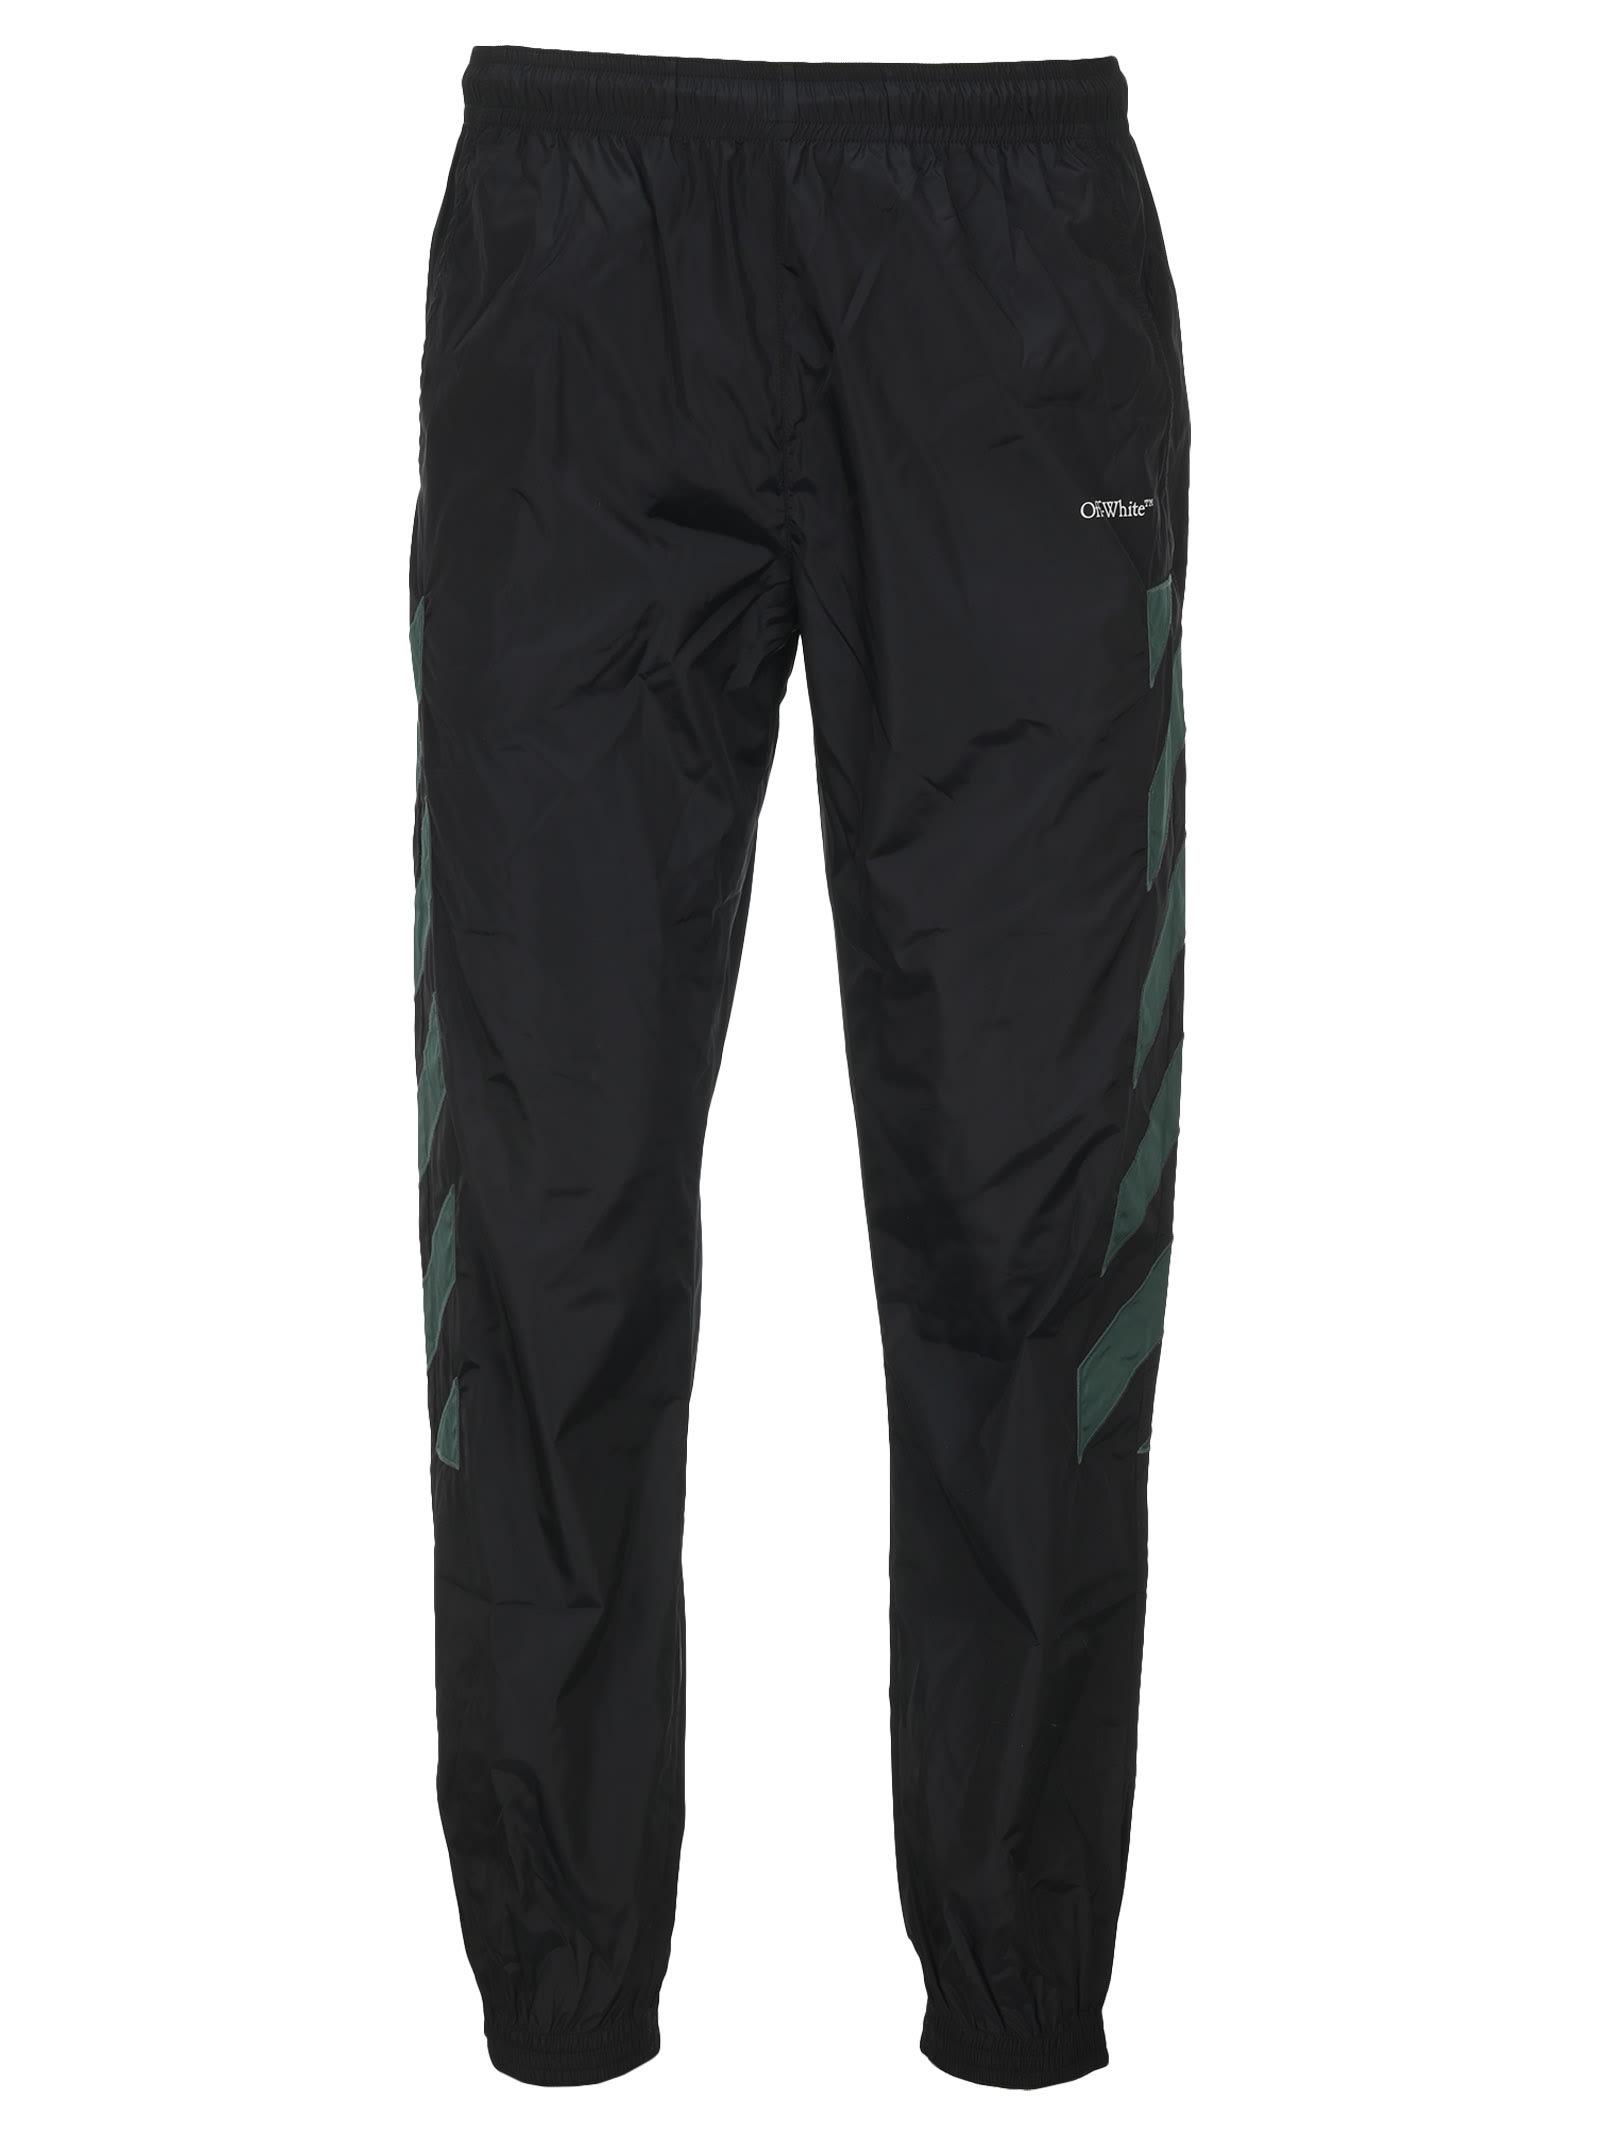 Off-White Off White Diag Nylon Track Pants